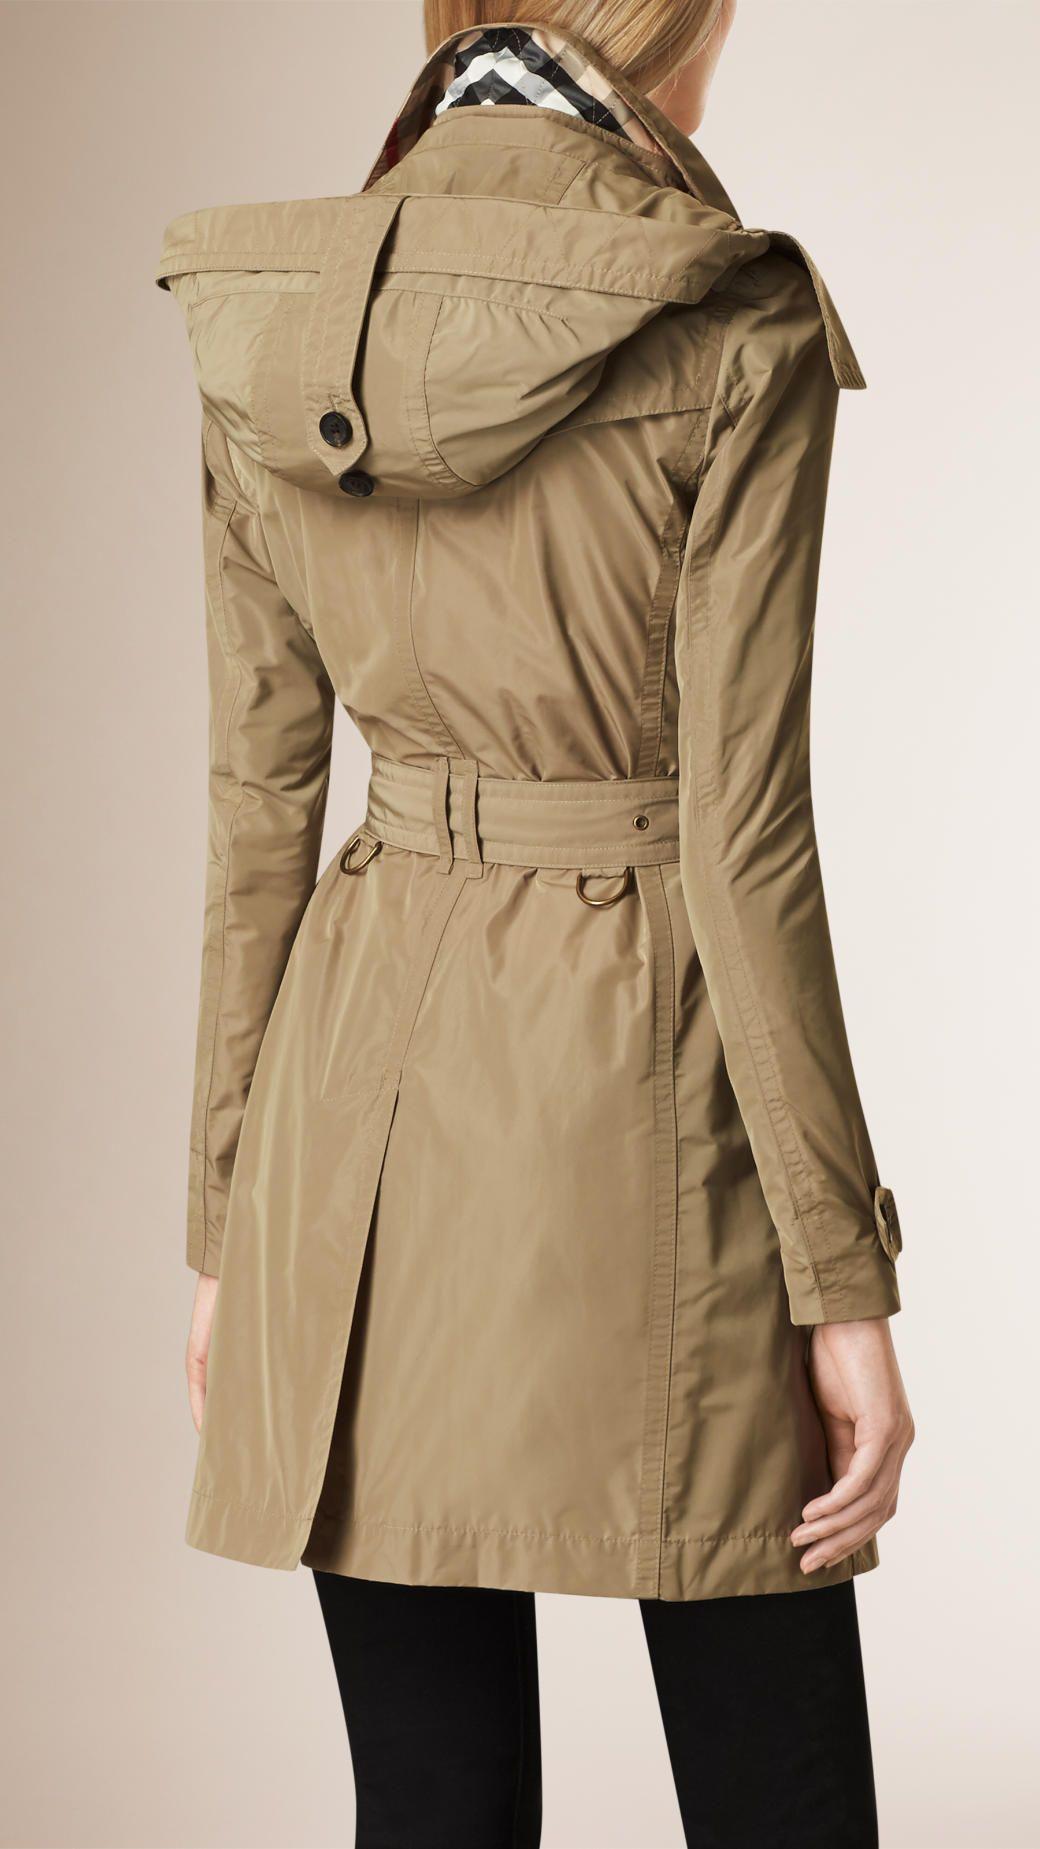 trench coat en taffetas capuche amovible sisal burberry manteaux vestes pinterest. Black Bedroom Furniture Sets. Home Design Ideas